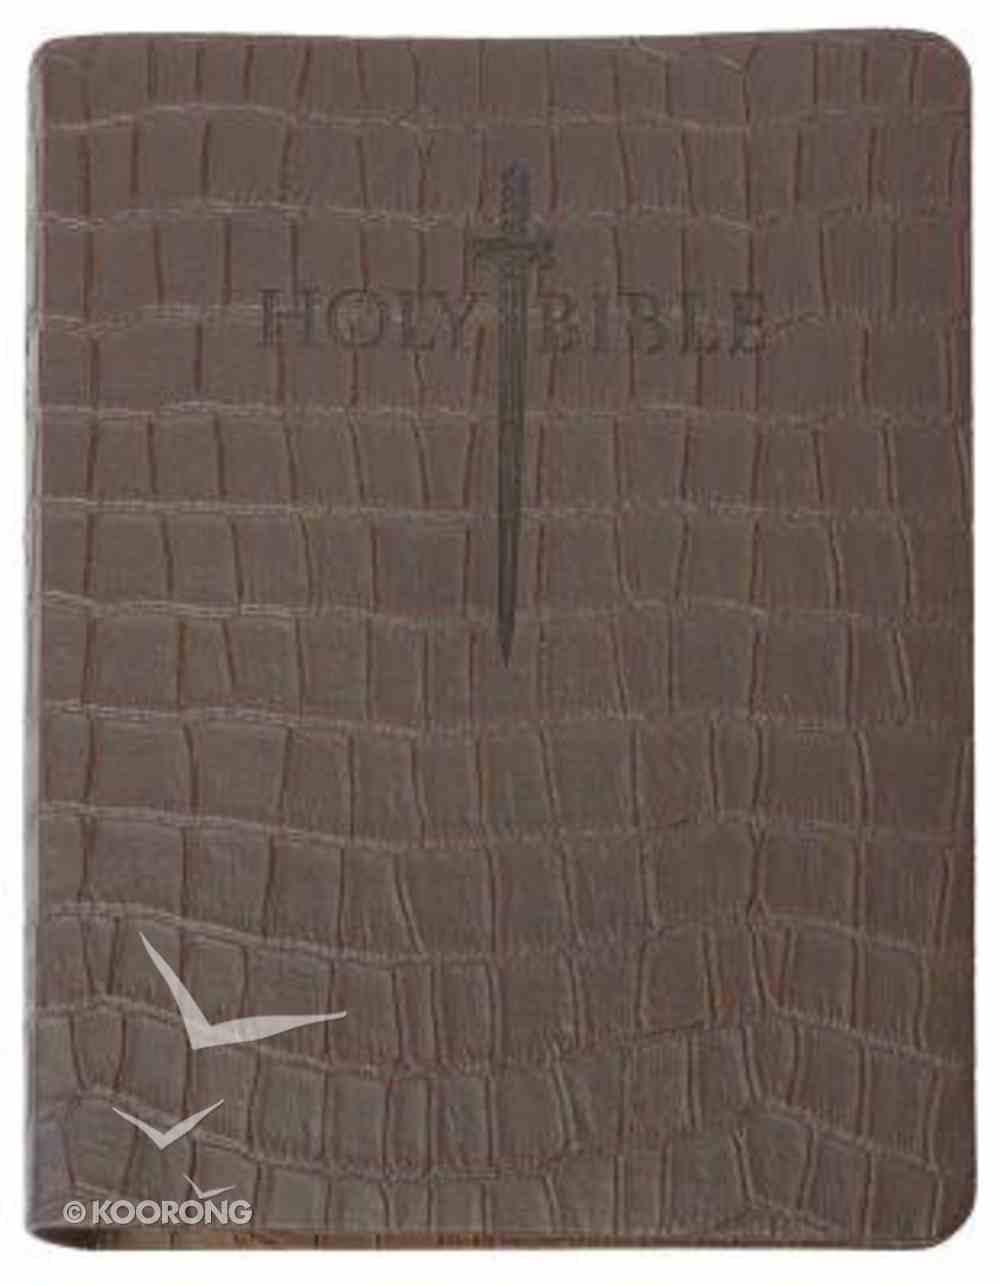 KJV Sword Study Bible Giant Print Brown T-Rex Ultrasoft Genuine Leather